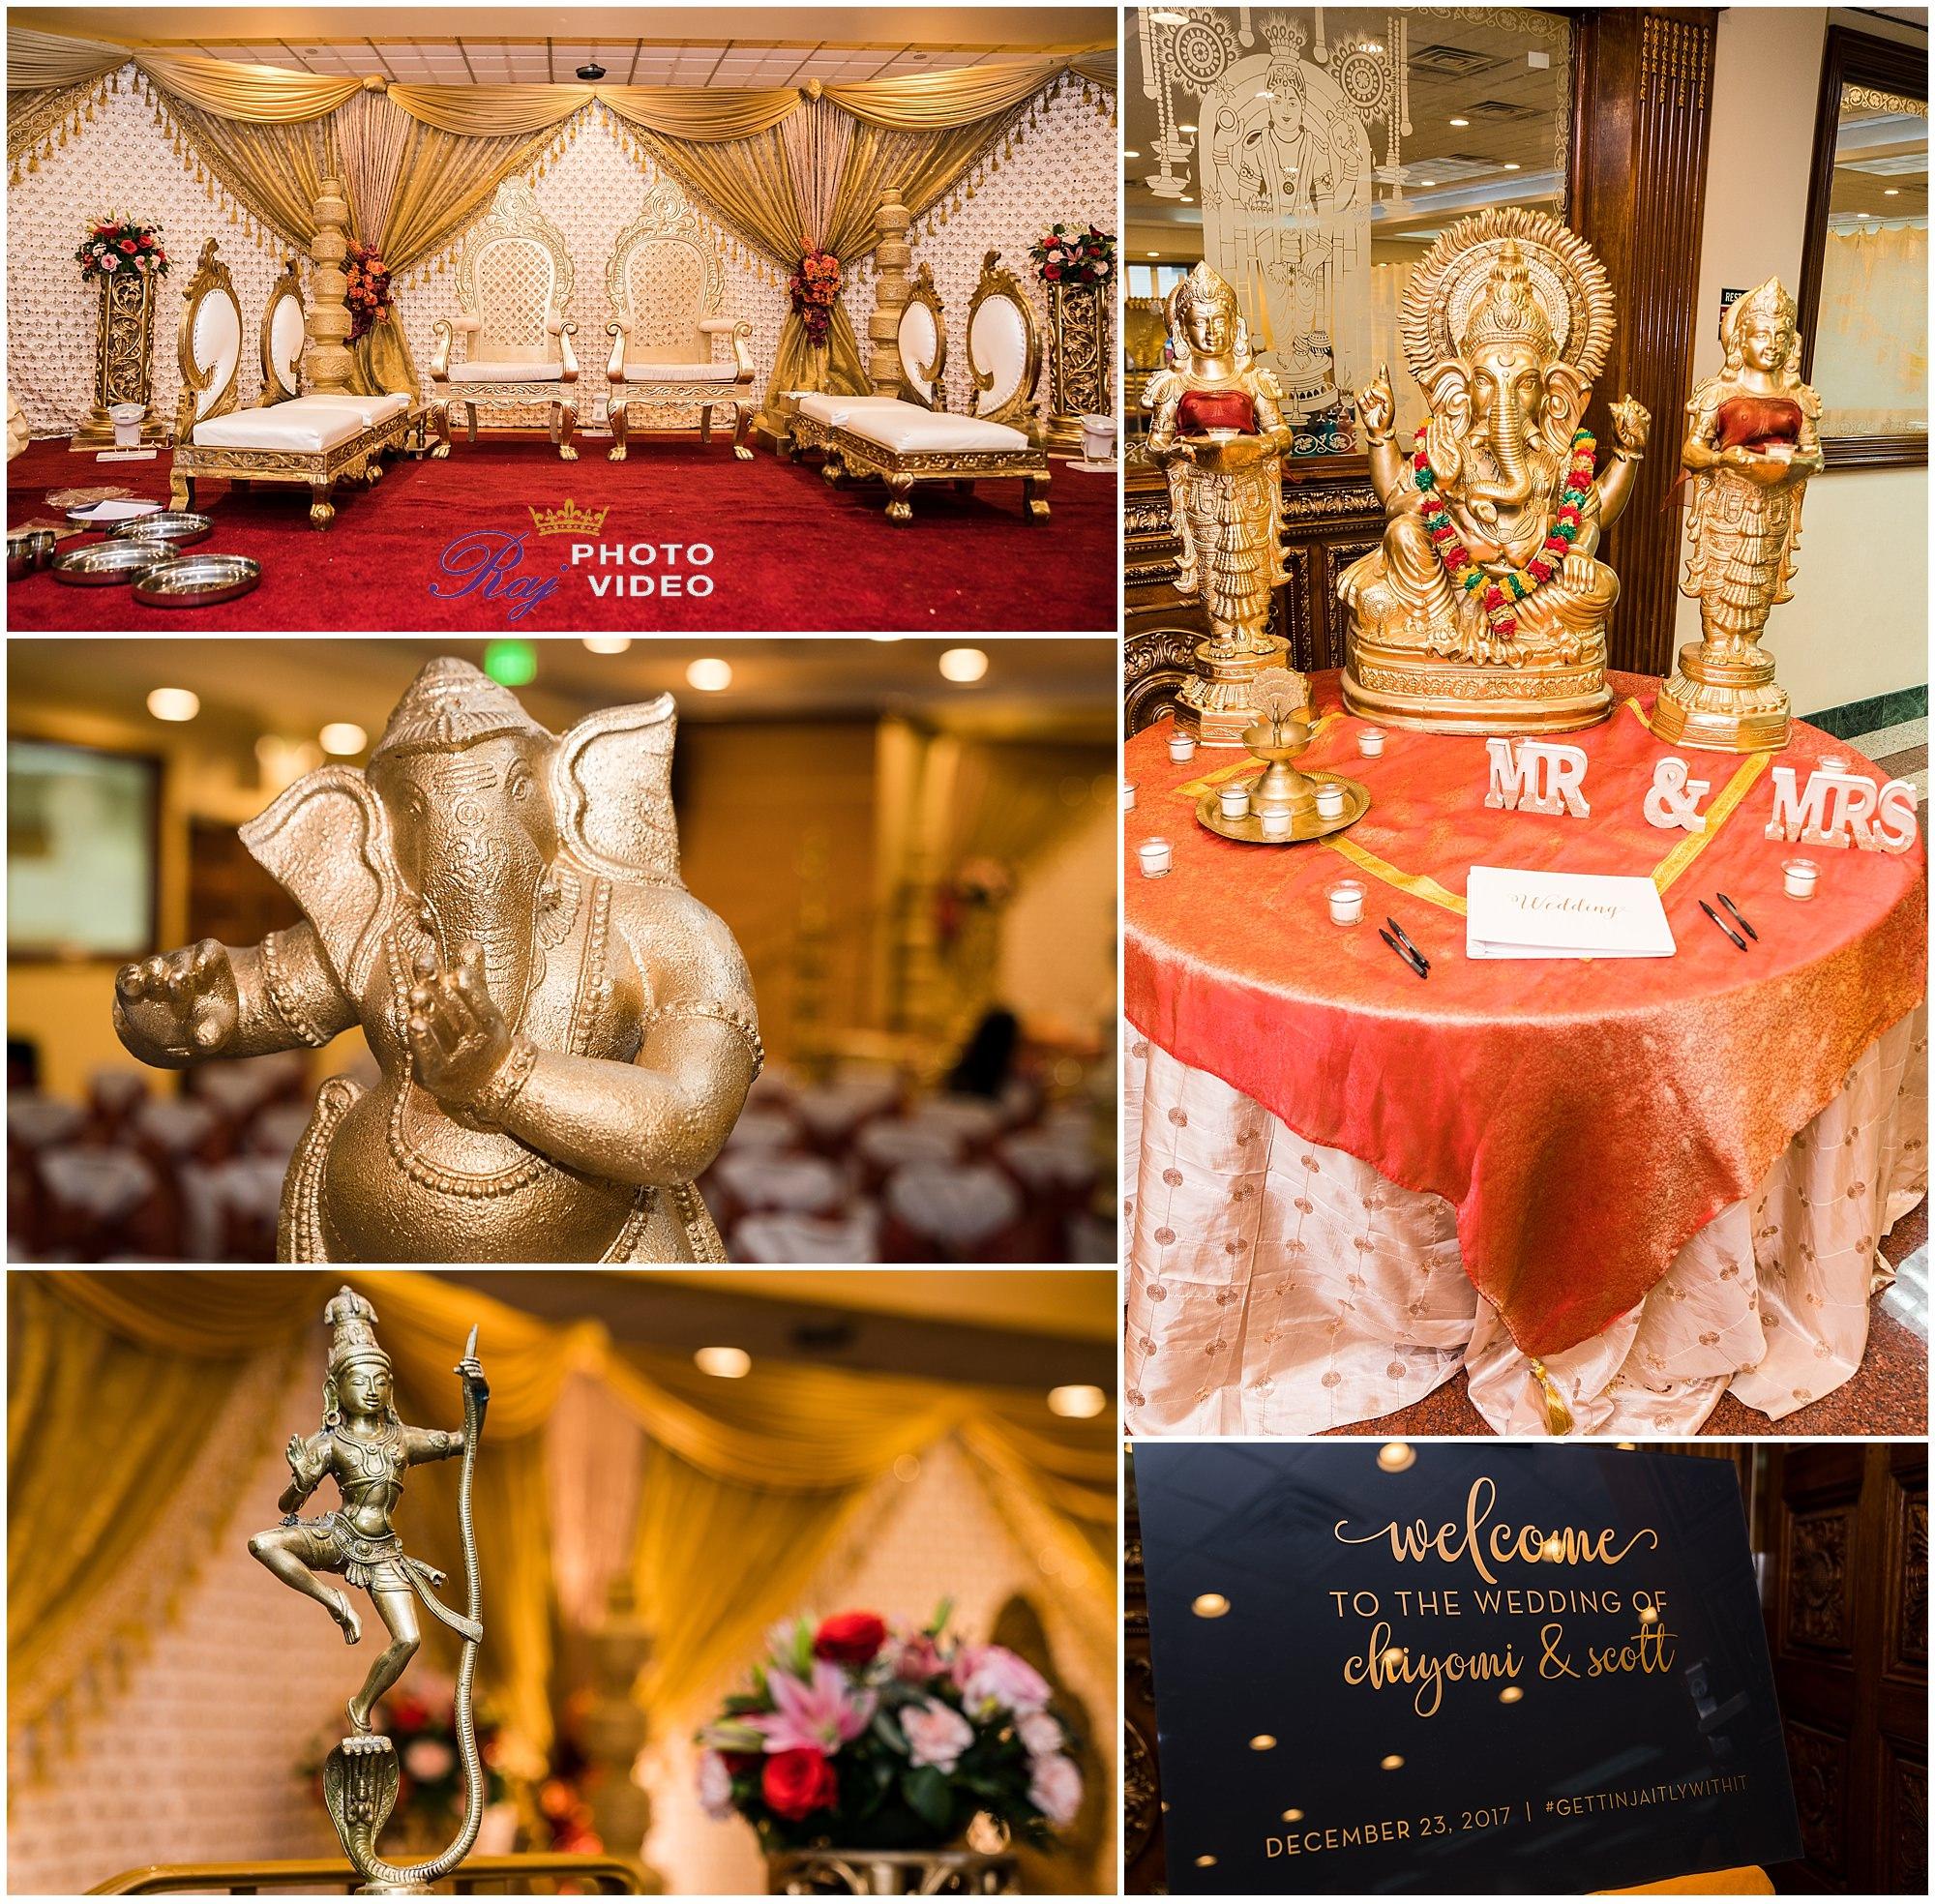 Sri-Guruvaayoorappan-Temple-Marlboro-NJ-Indian-Wedding-Chiyomi-Scott-00003.jpg